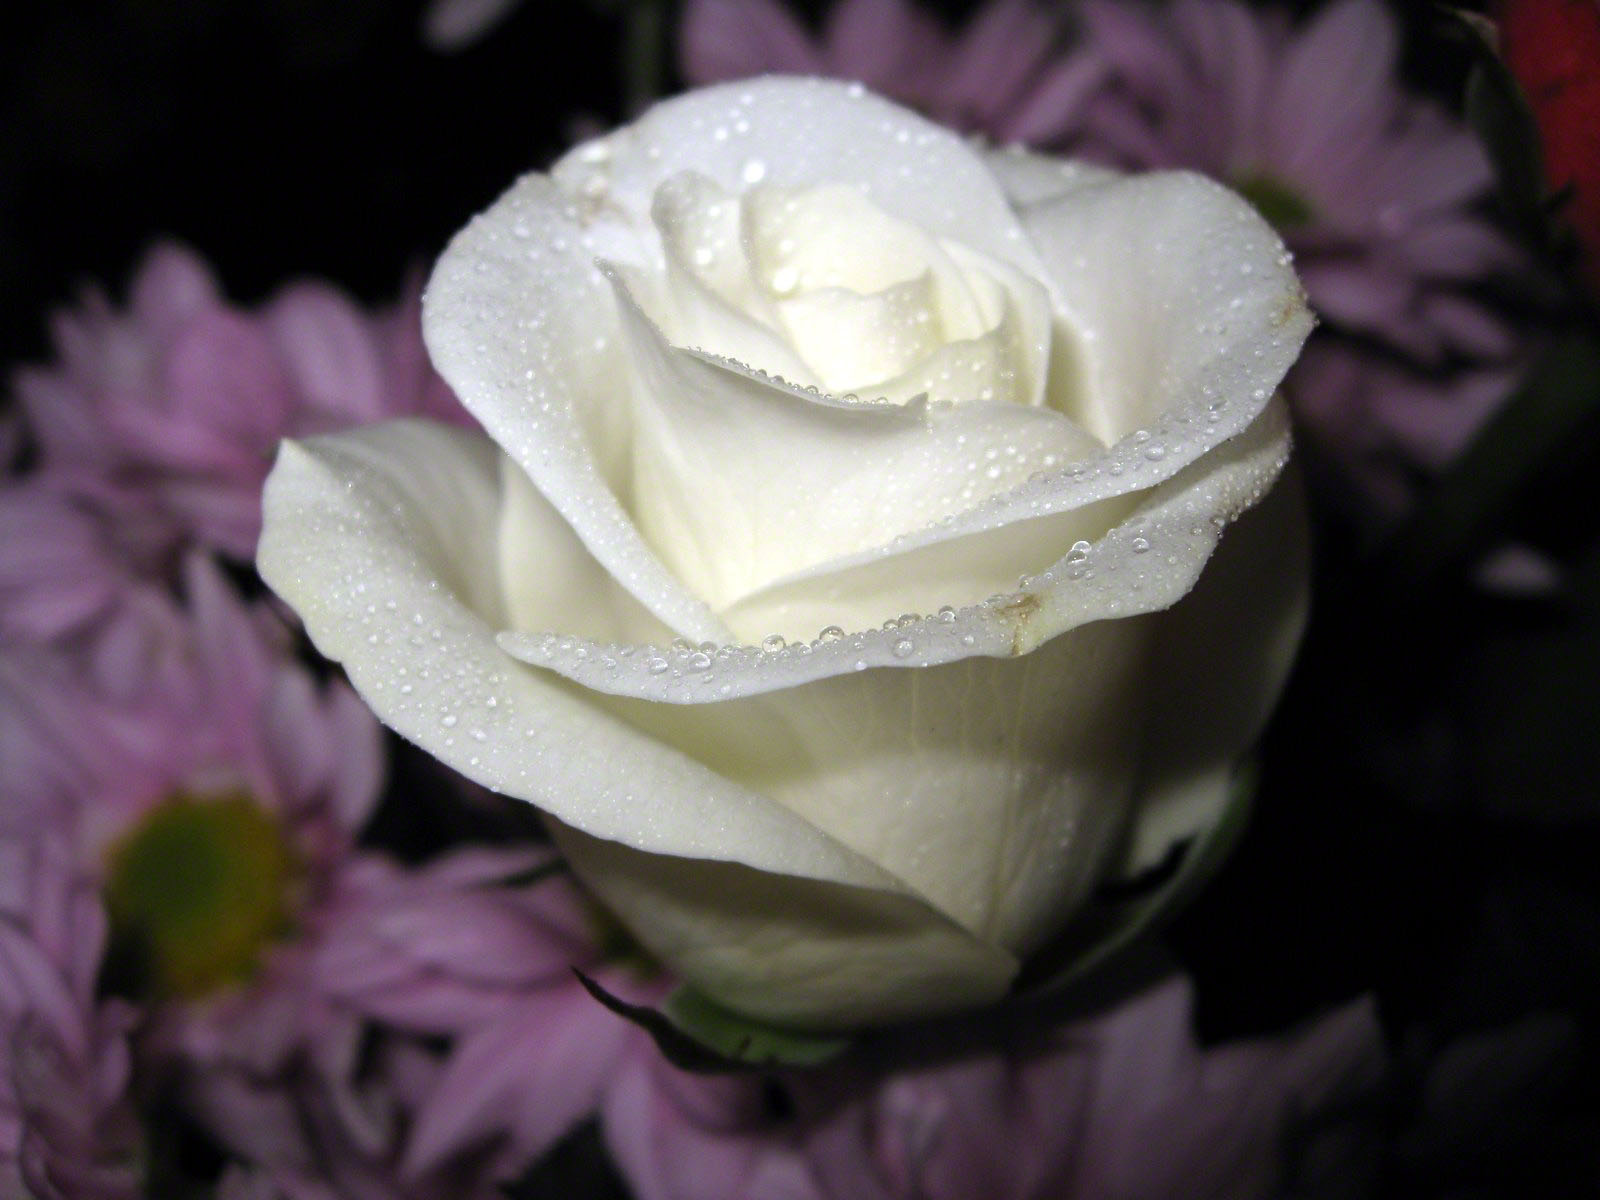 http://www.fabiovisentin.com/photography/photo/12/roses-wallpaper-roses-bouquets4473.JPG